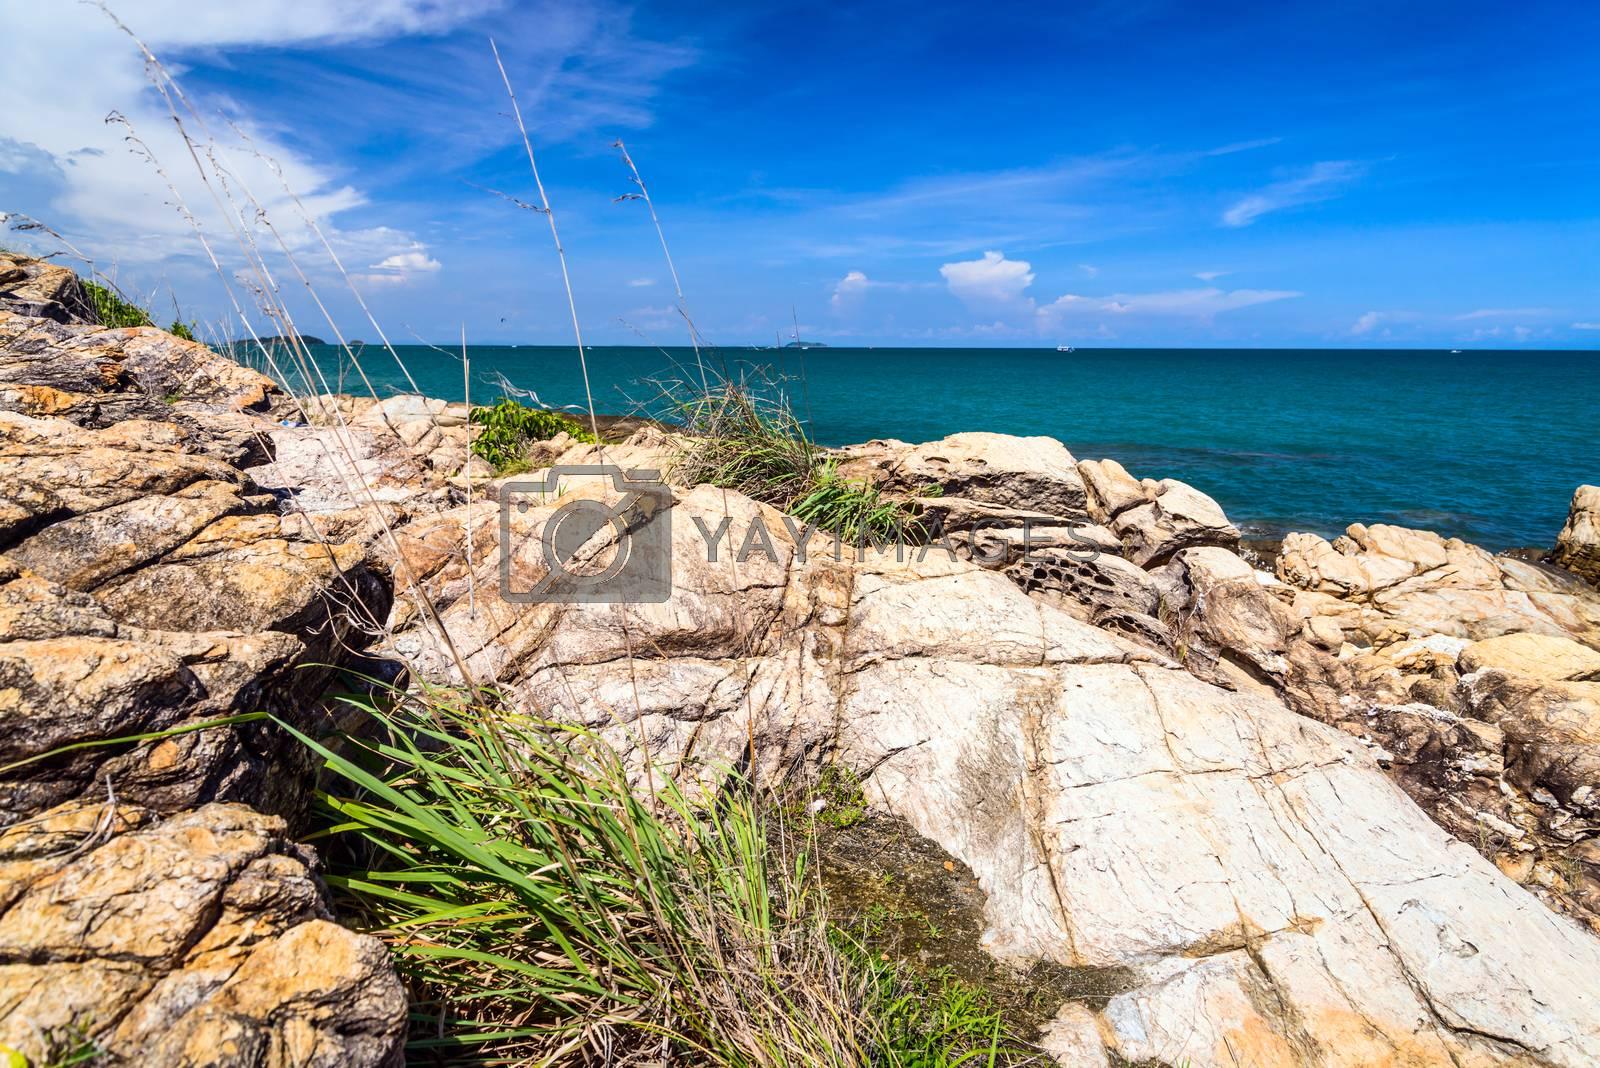 Koh Samet - Khao Laem Ya National Park, Rayong, Gulf of Thailand by jakgree